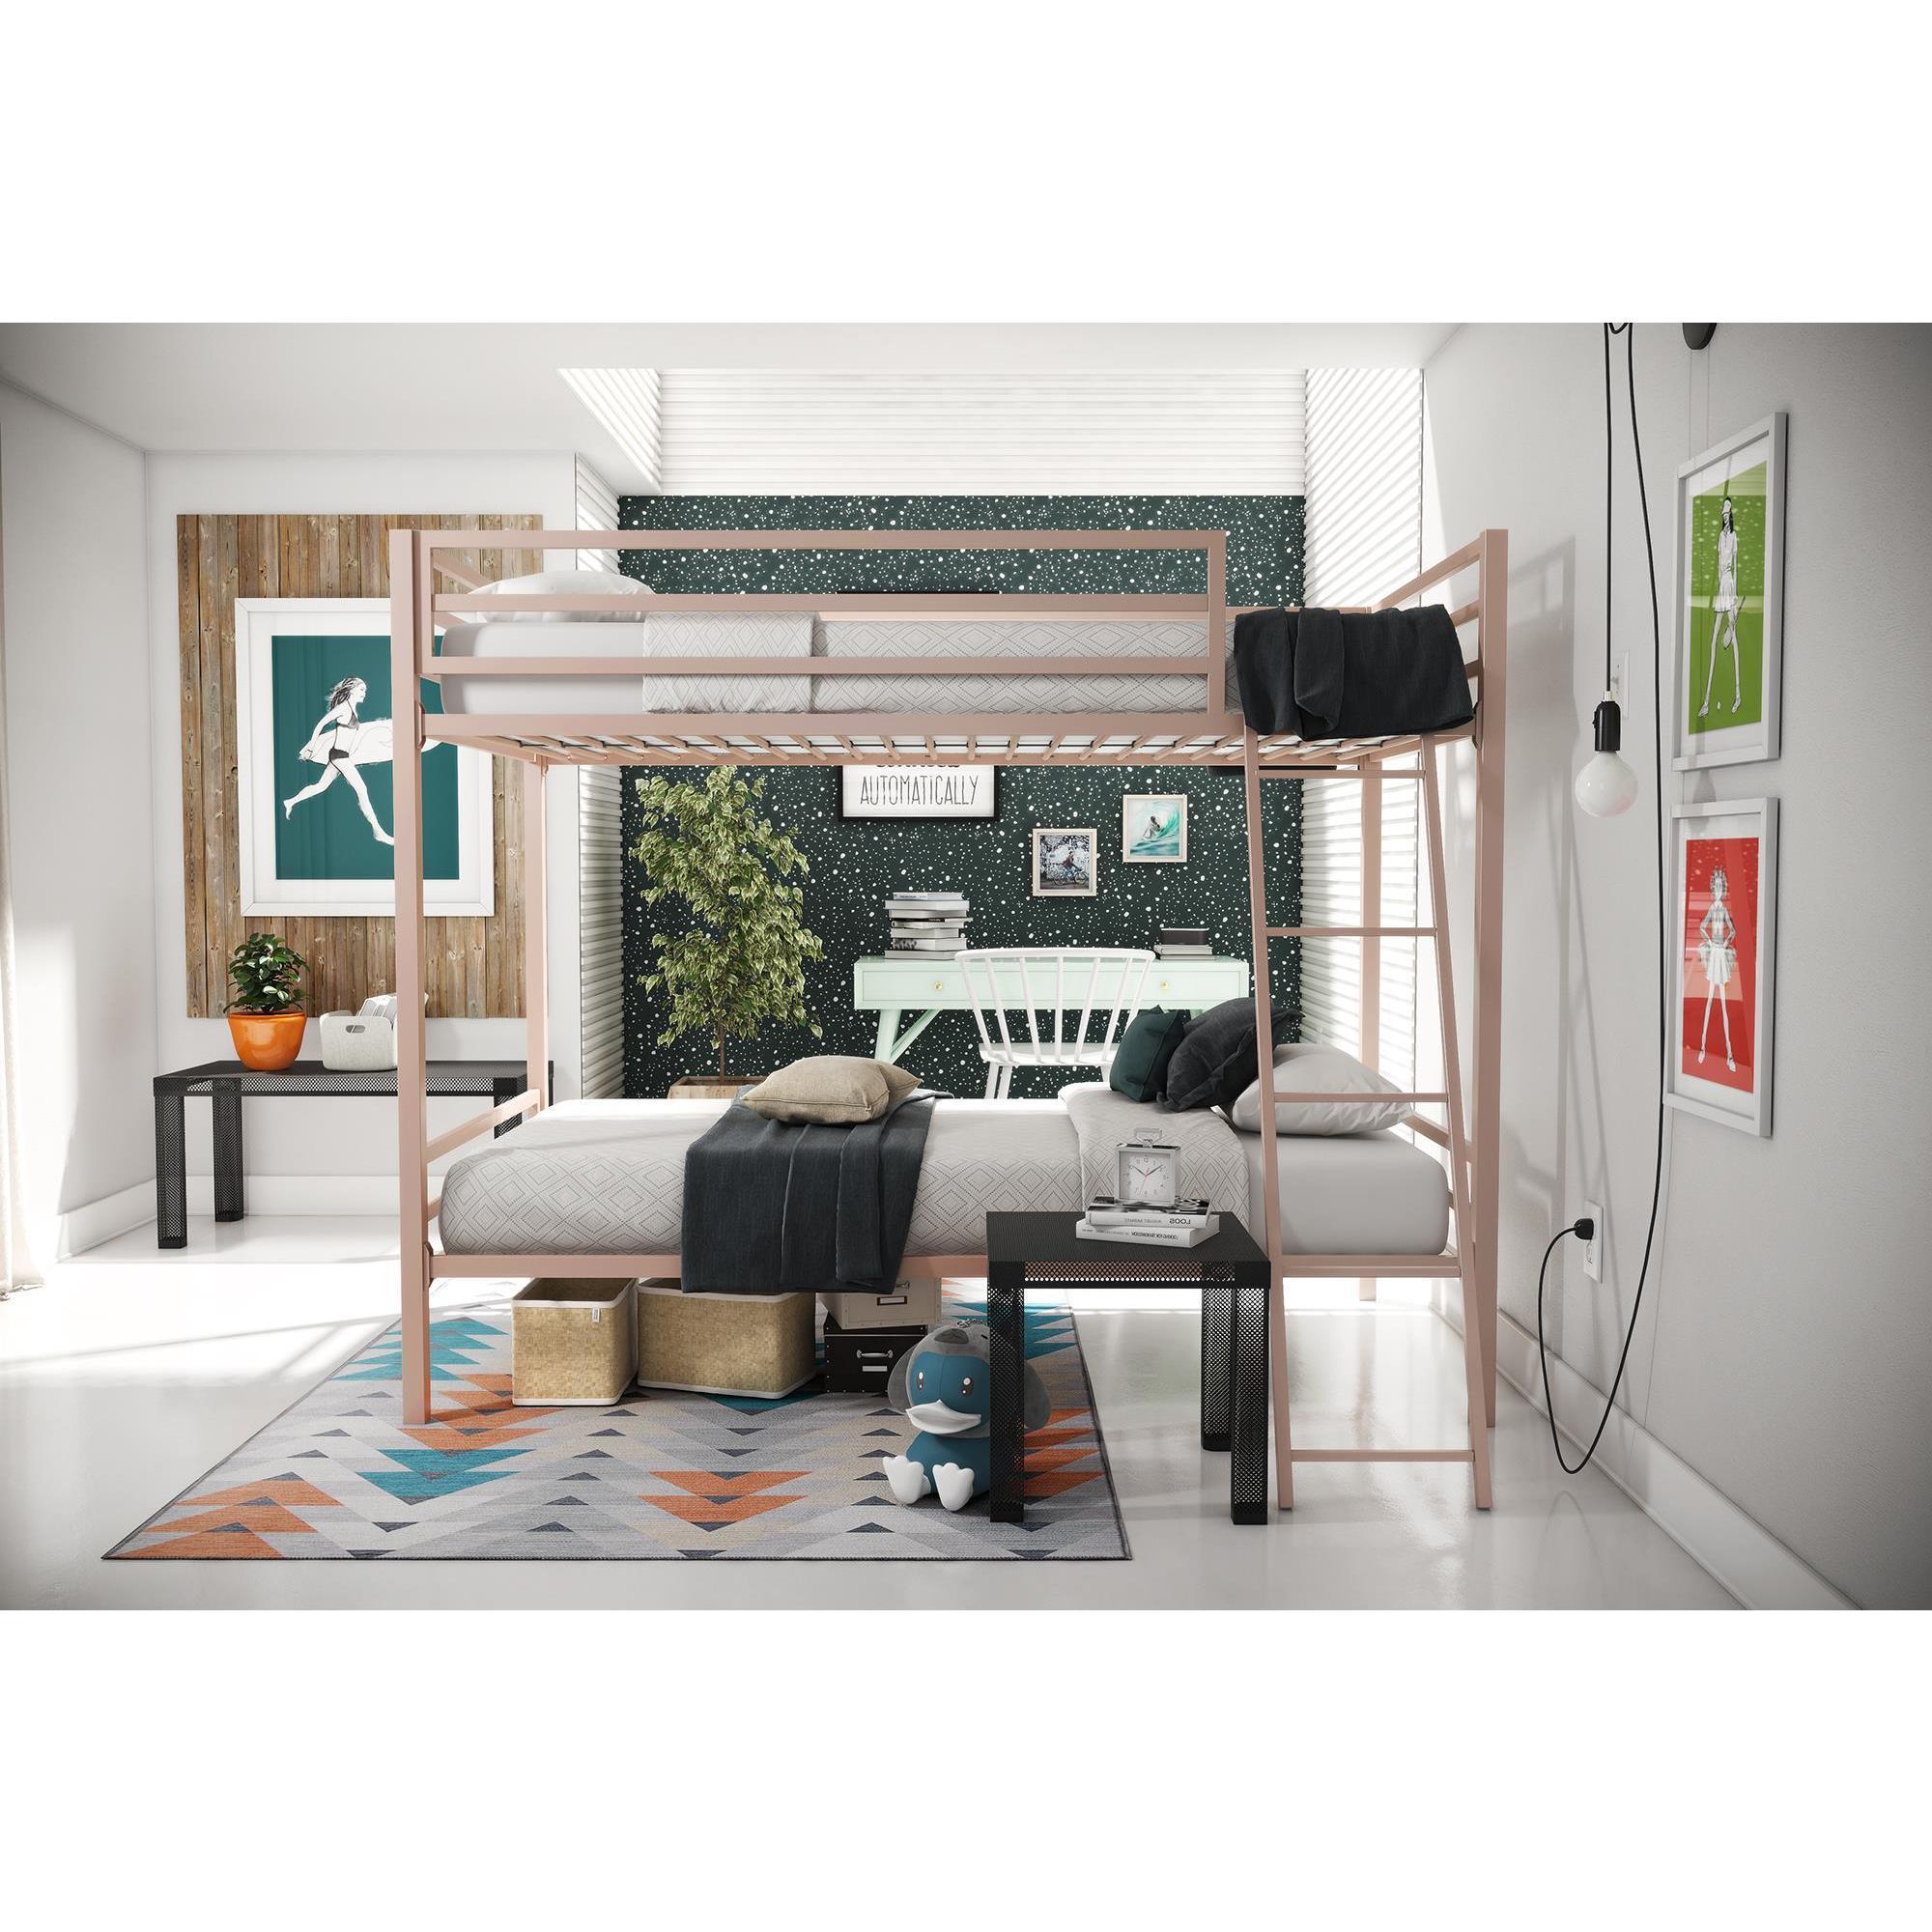 loft coriver awesome bunk low best ceiling bed the homes xloft beds plans